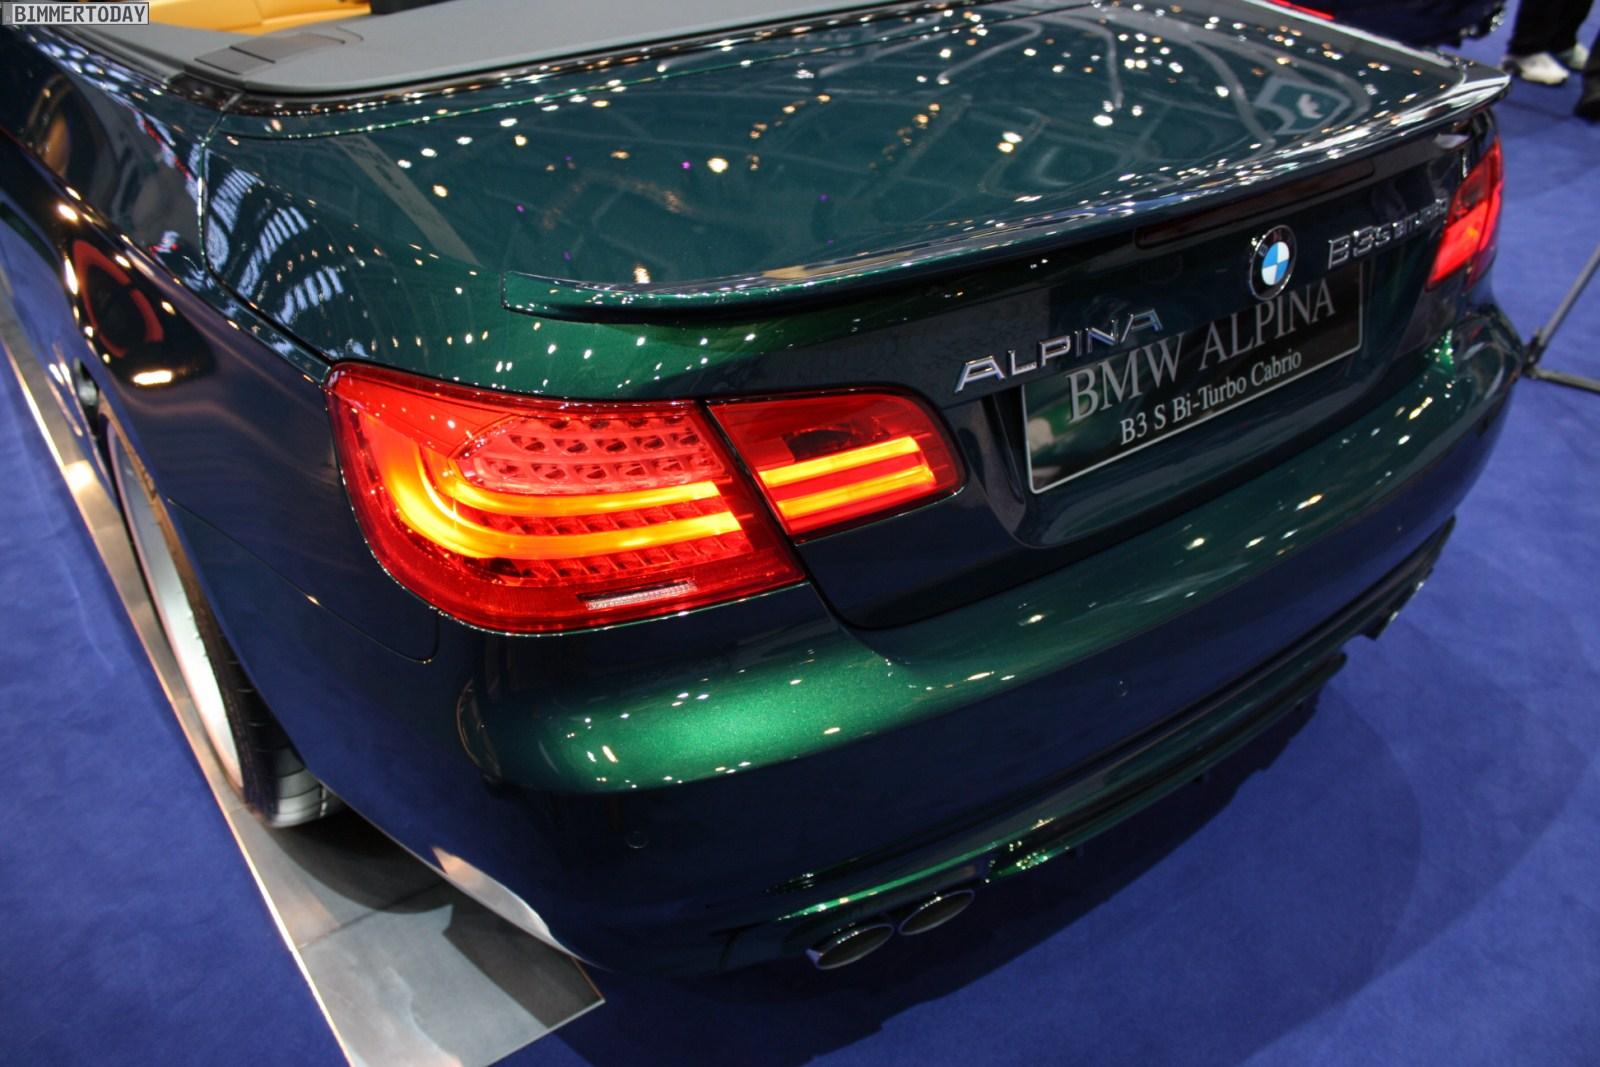 BMW Alpina B3S Biturbo Cabrio Genf 2011 12